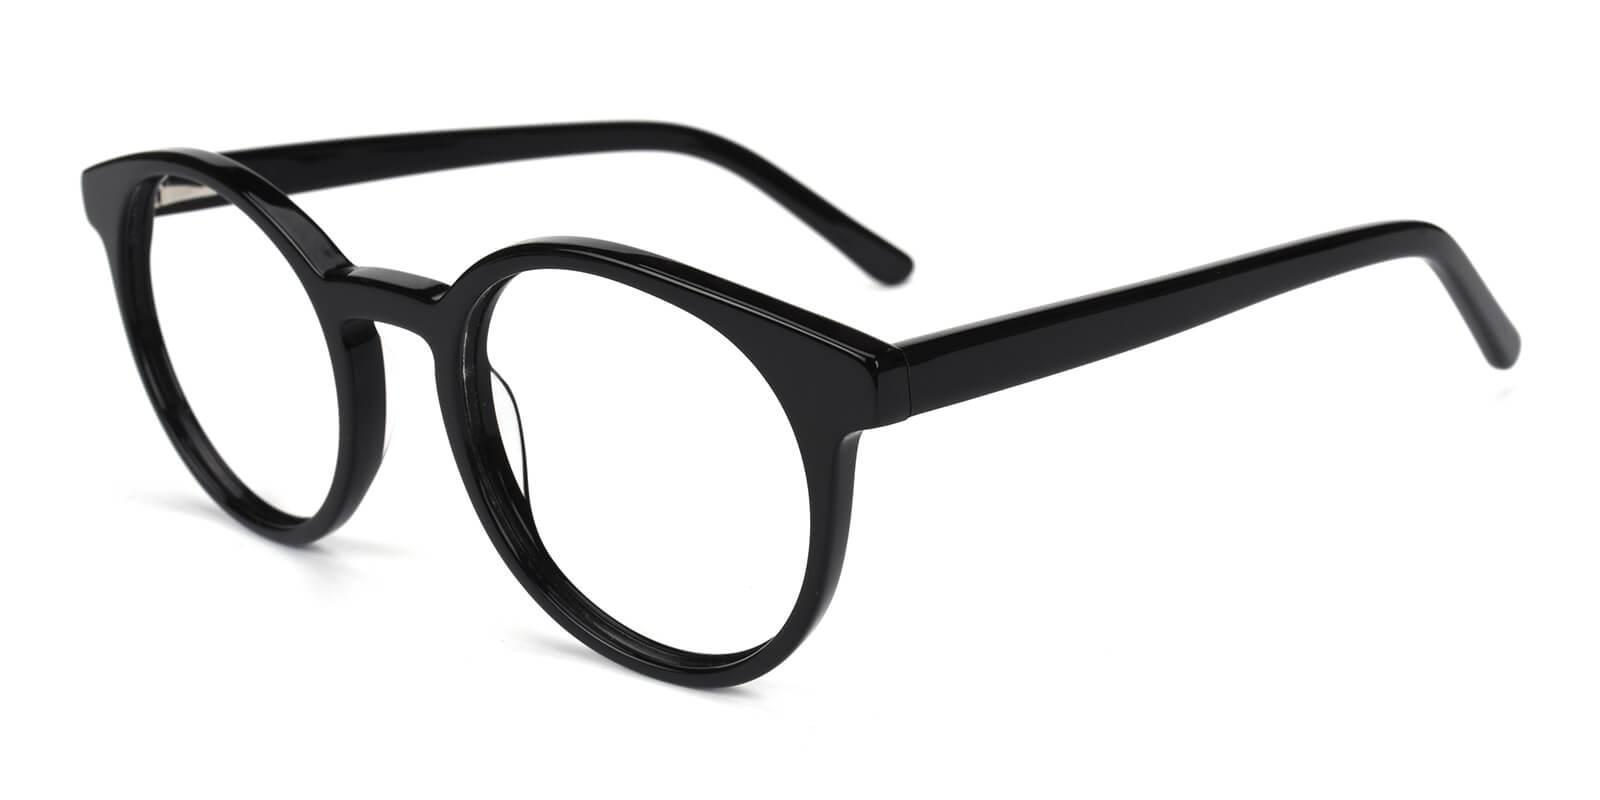 Chocolate-Black-Round-Acetate-Eyeglasses-additional1